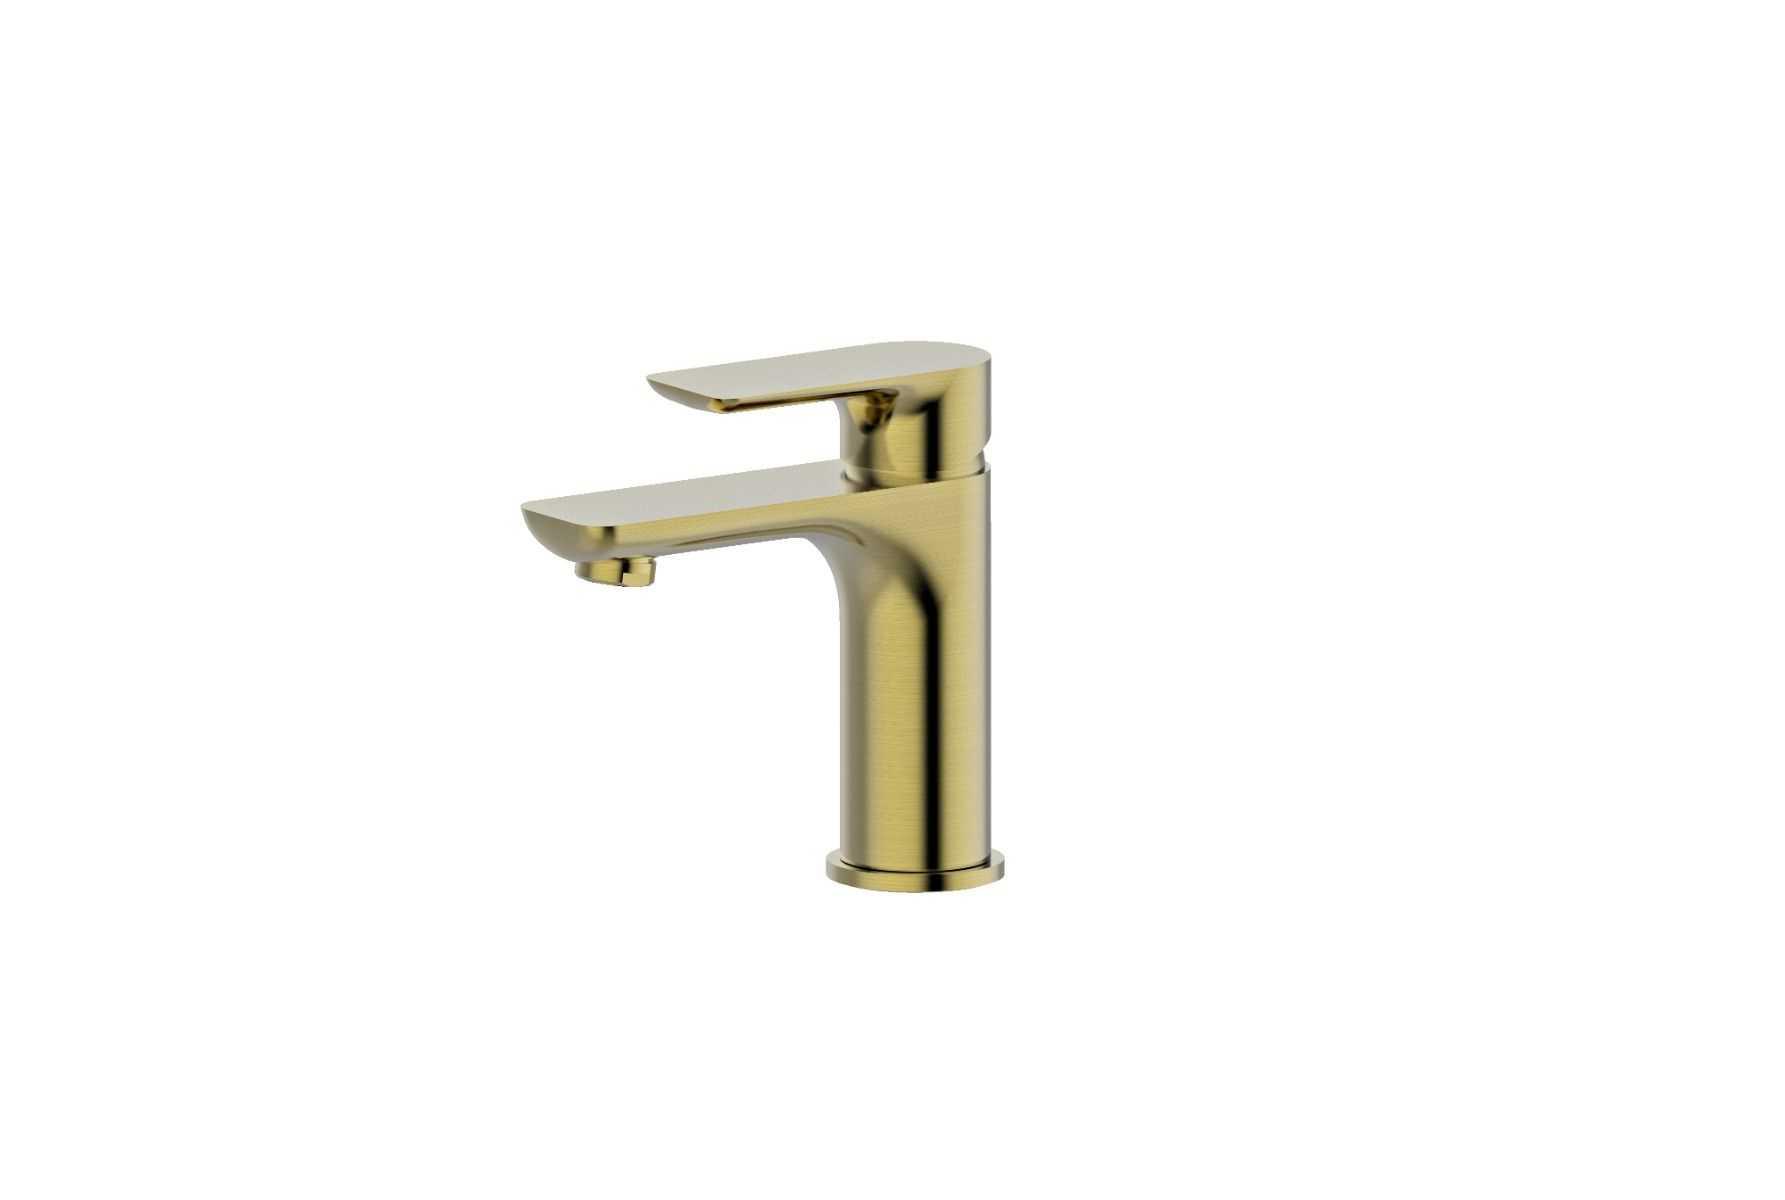 LUXUS Brushed Gold Basin Mixer